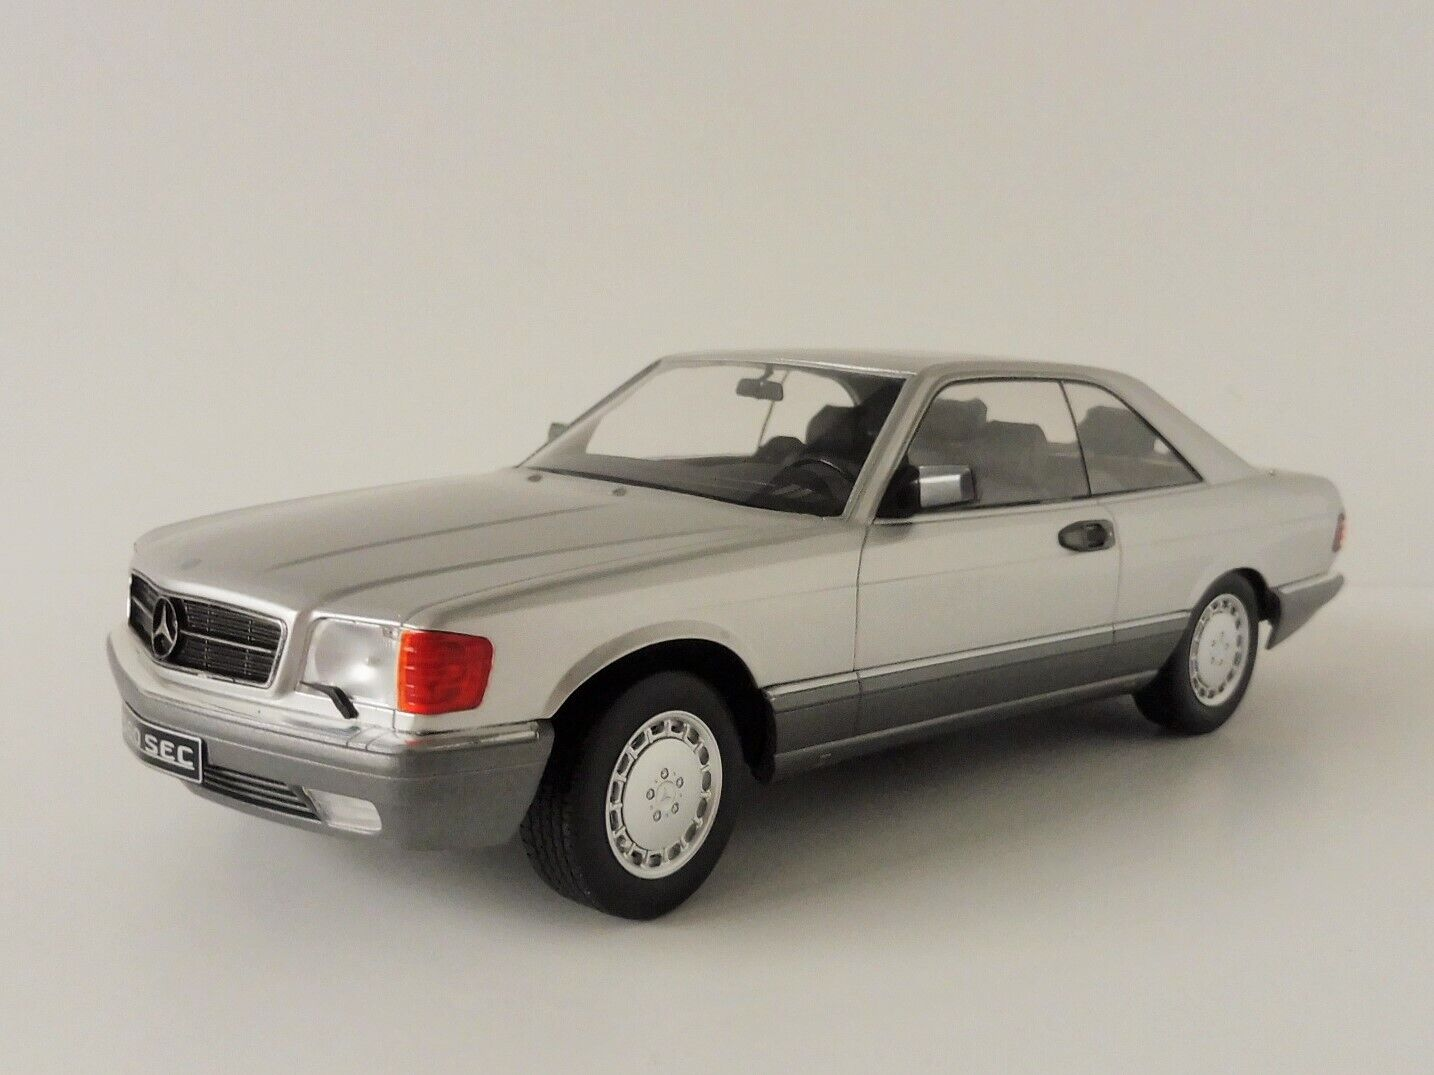 Mercedes-Benz 560 Sec 1985 1 18 KK-Scale KKDC 180332 c126